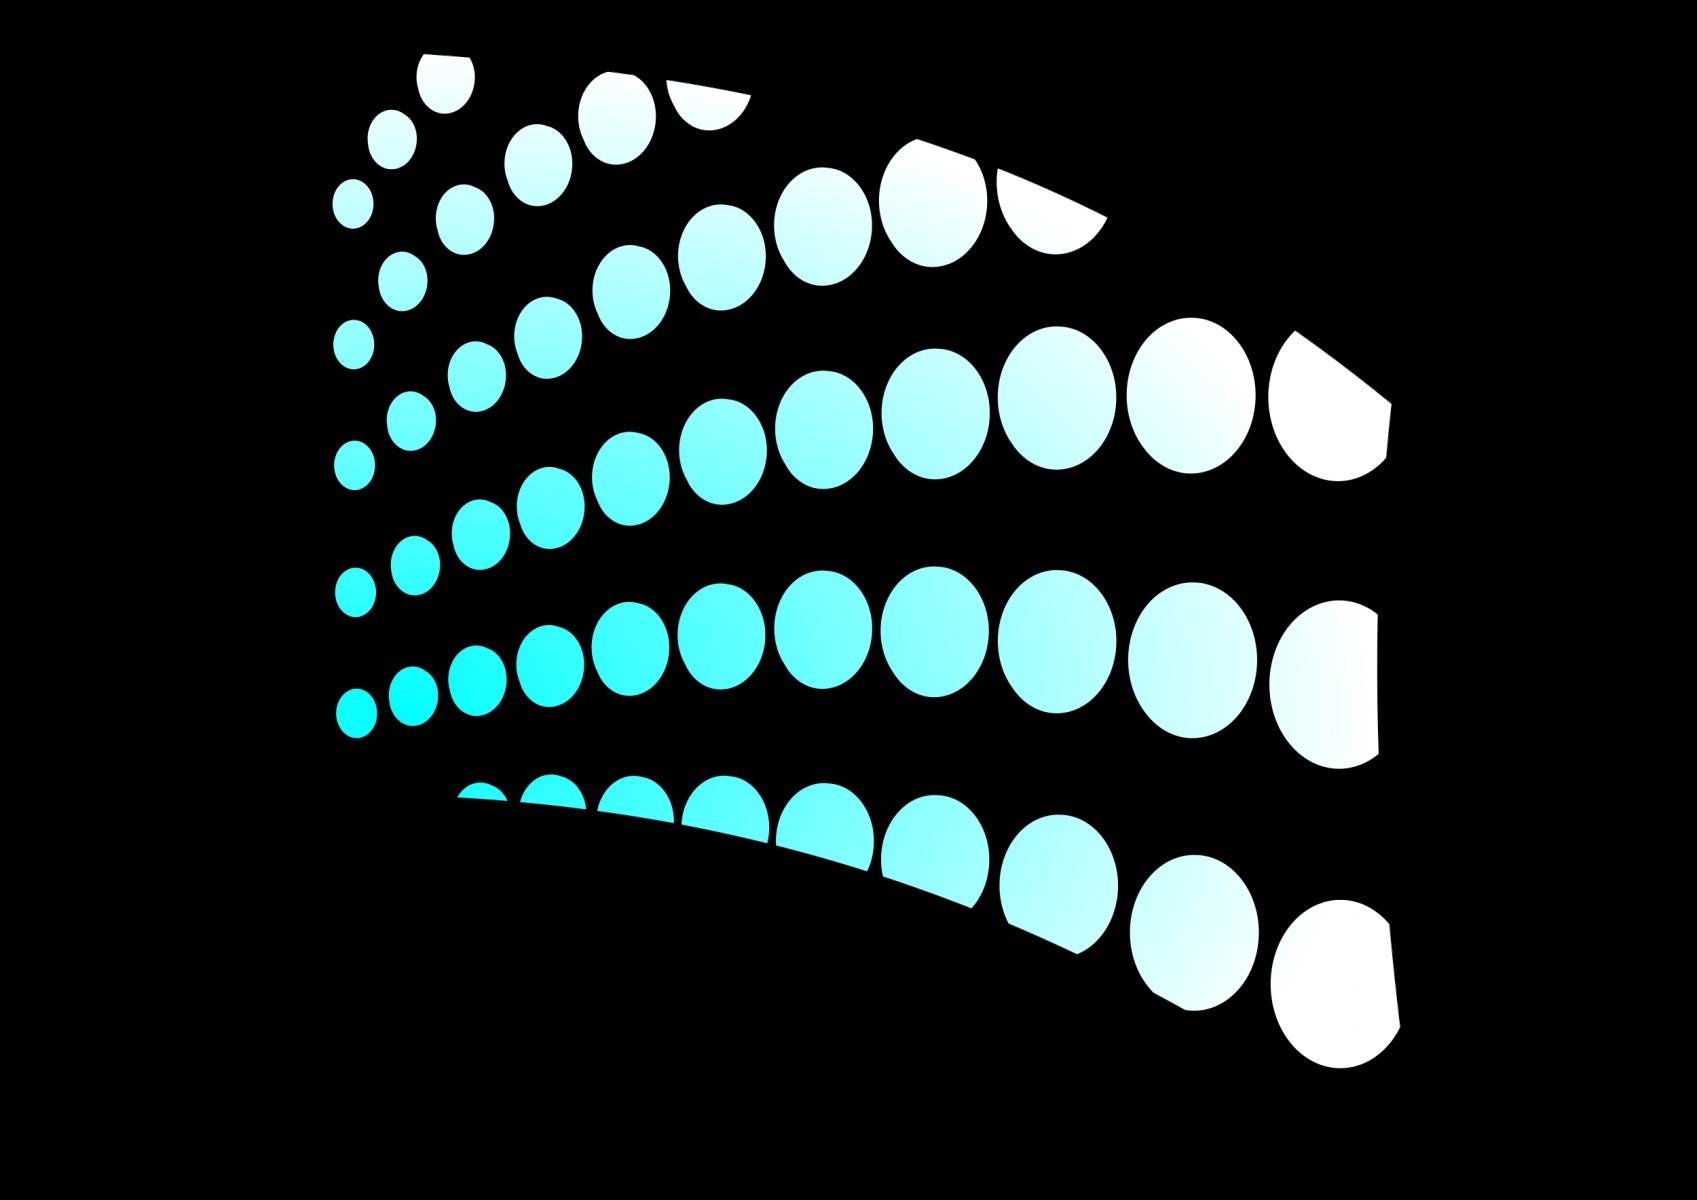 030106s - 36x54 Standard Teal Arced Circles